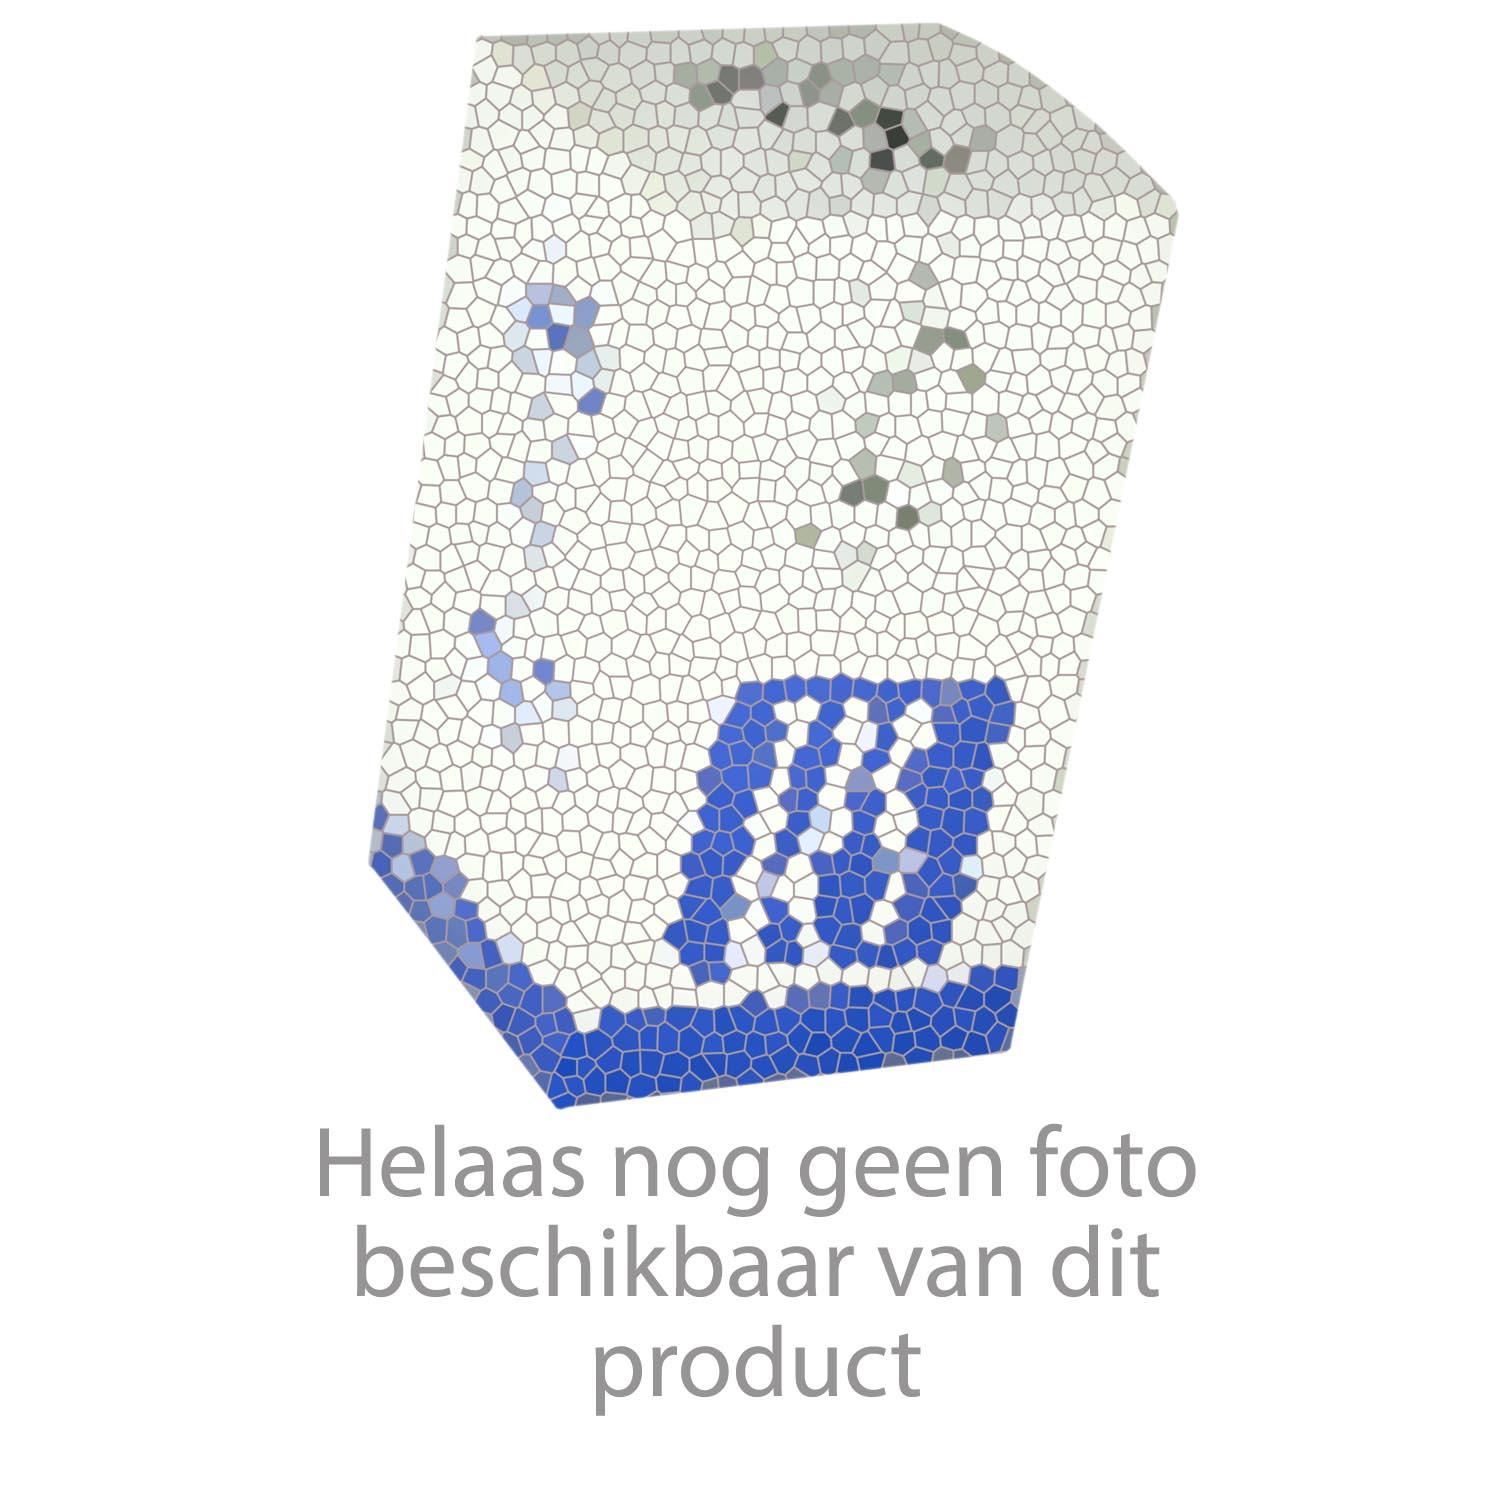 Delabie knijpdouche 1/2 tbv grootkeukenkraan Chroom / Wit artikelnummer 433000